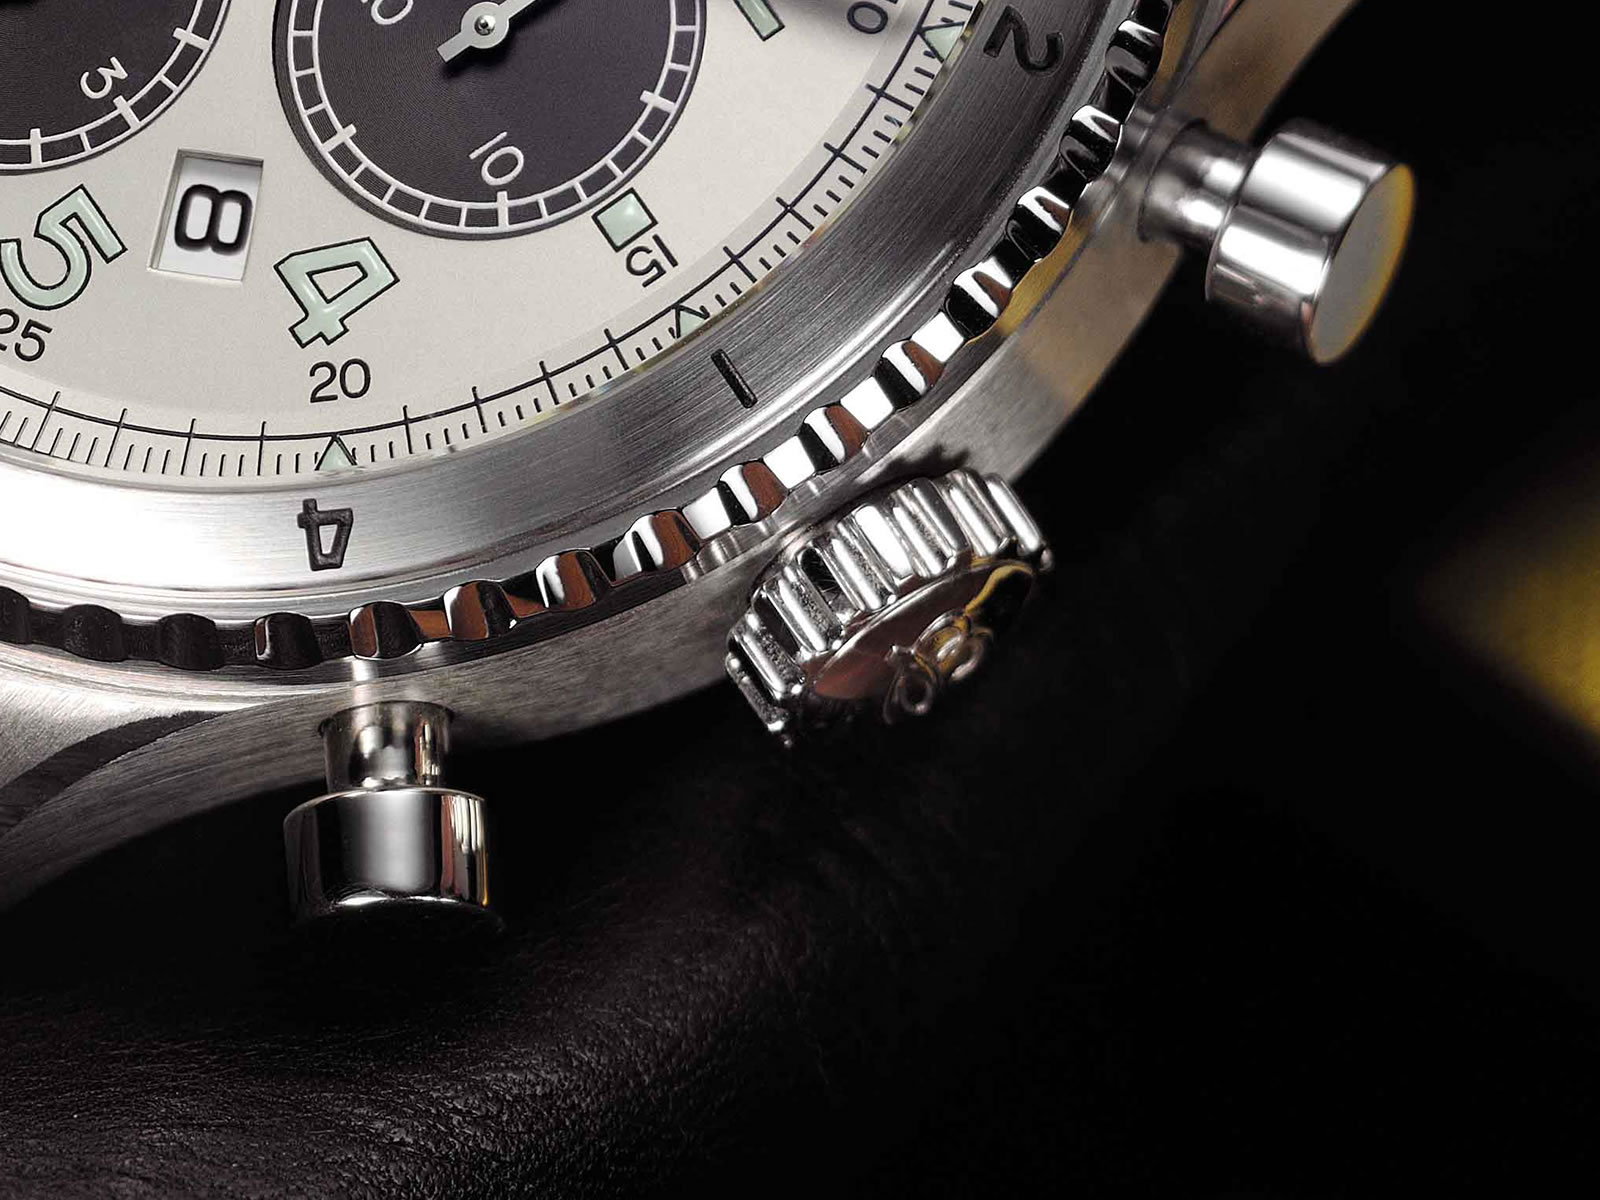 ab01171a-g839-breitling-navitimer-aviator-8-b01-the-chronograph-43-7.jpg